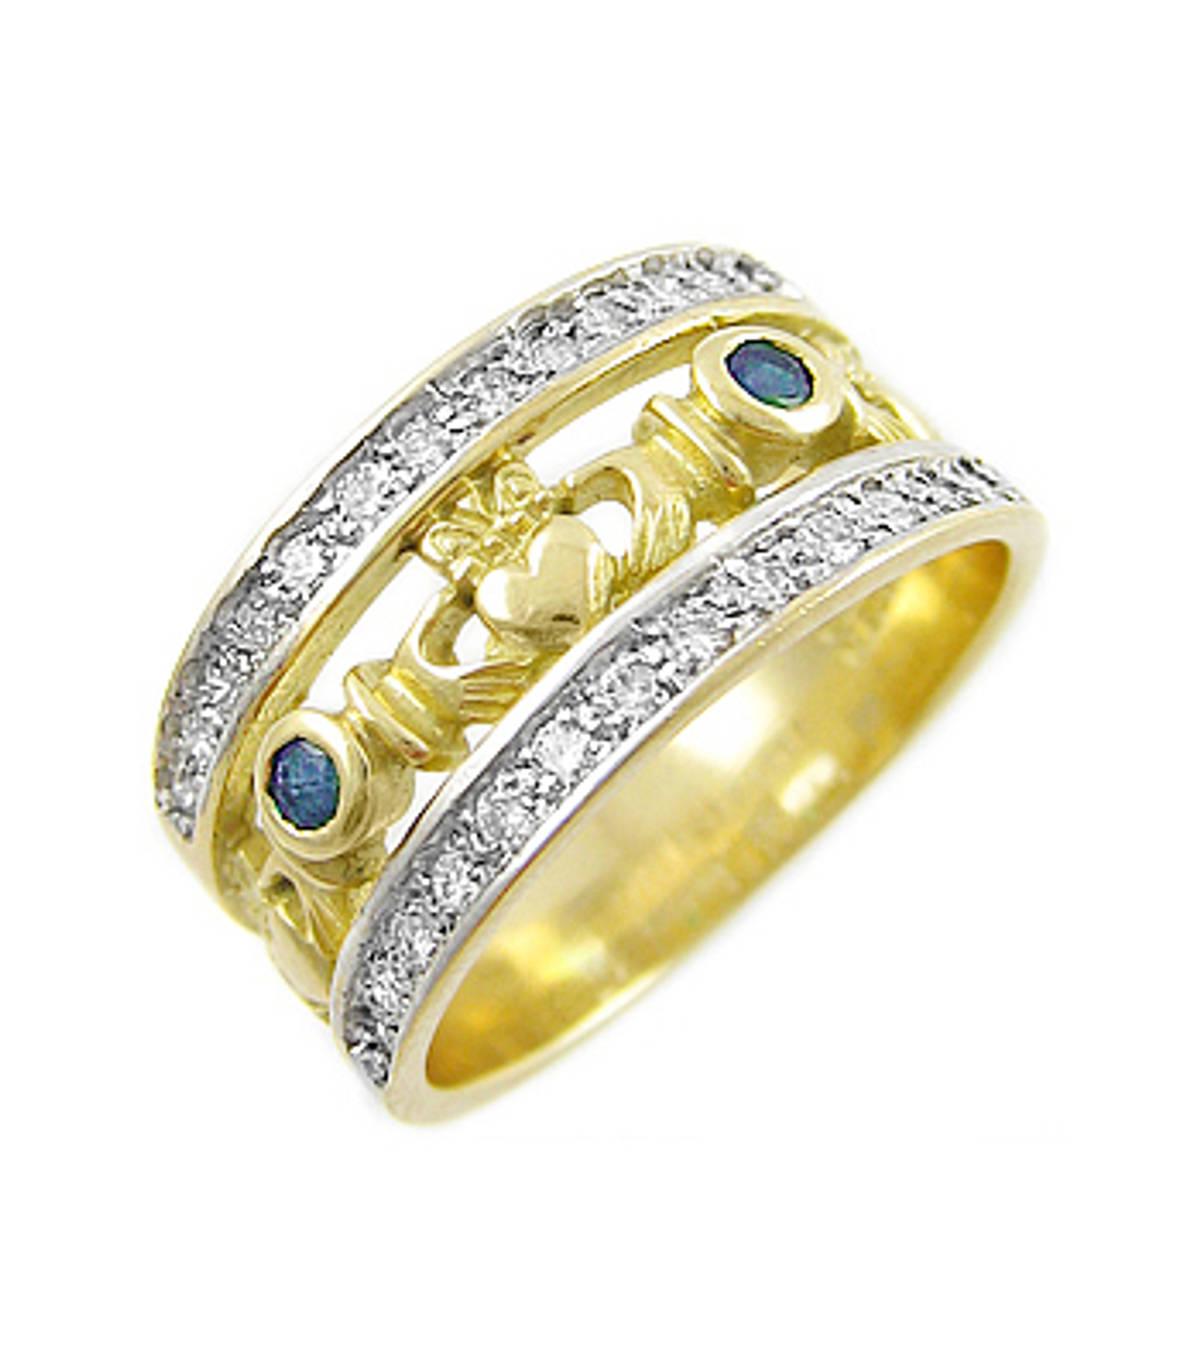 Irish made14 carat yellow gold sapphire 0.10cts/diamonds 0.26cts claddagh engagement ring